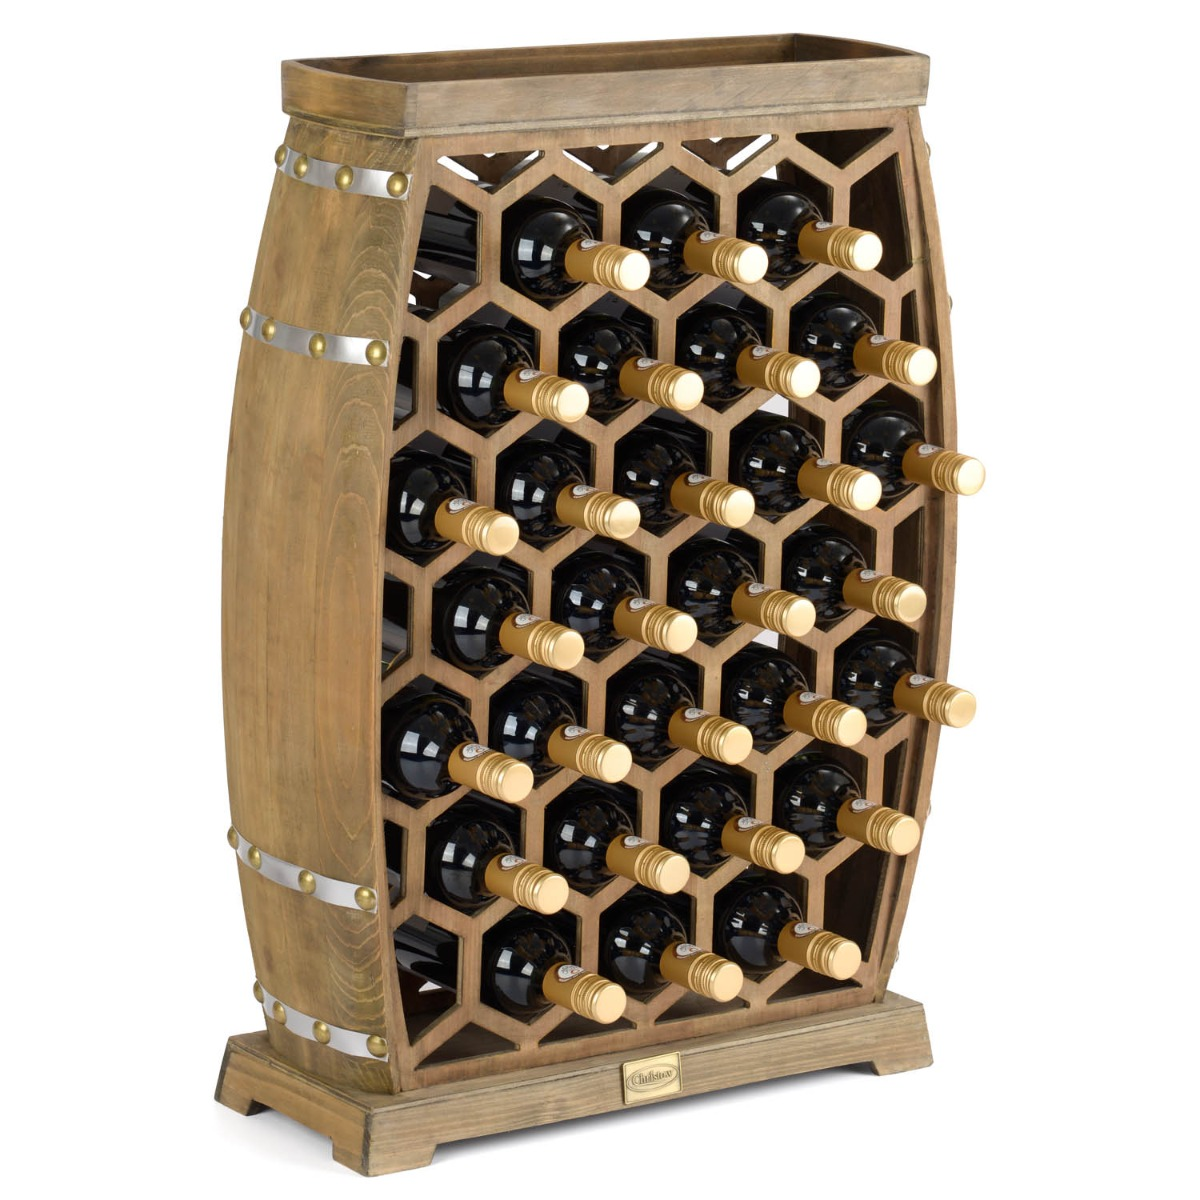 Image of 24 Bottle Honeycomb Wine Rack